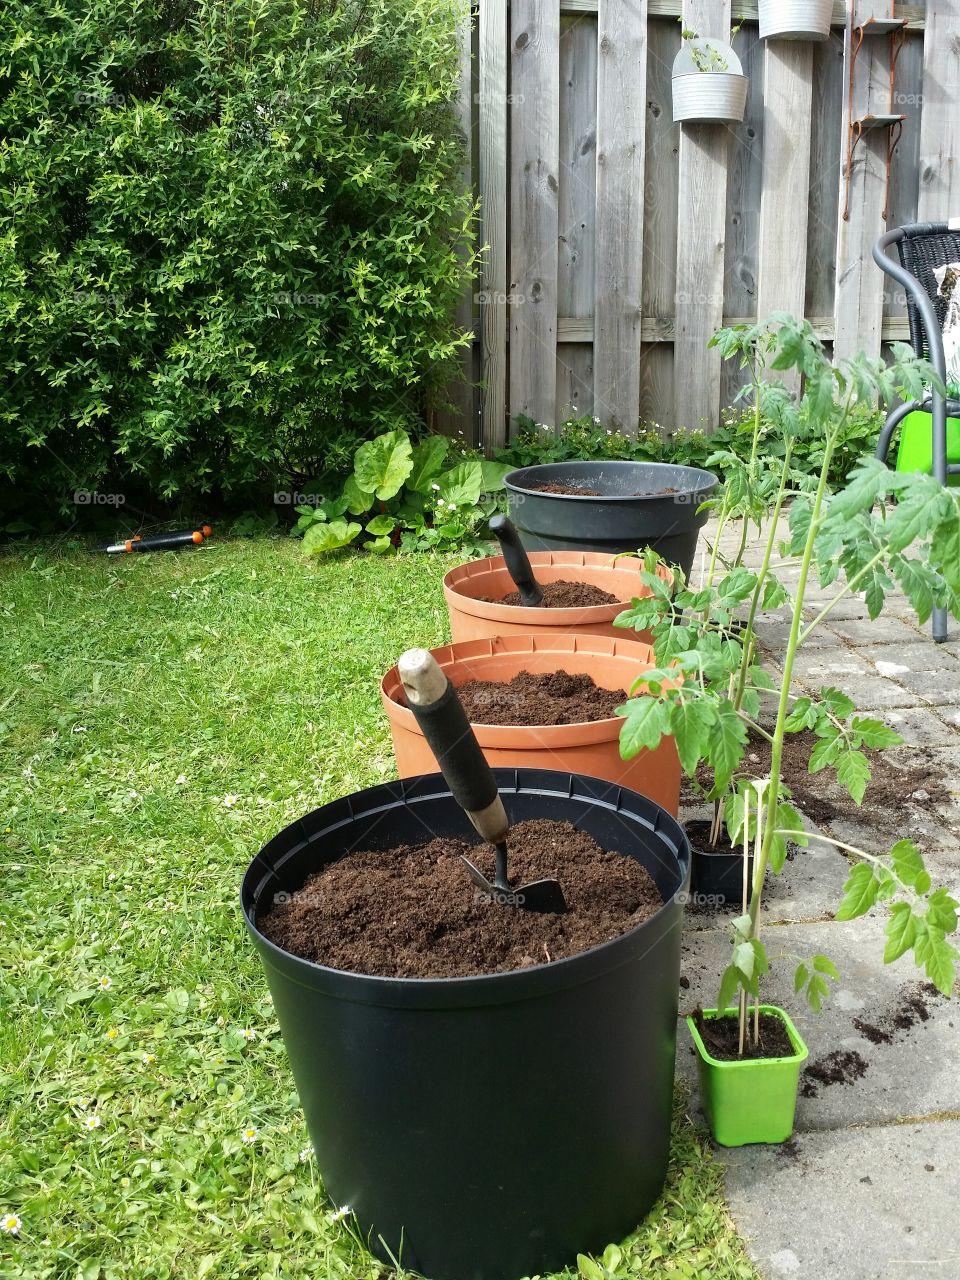 Gardening - Planting tomatoes